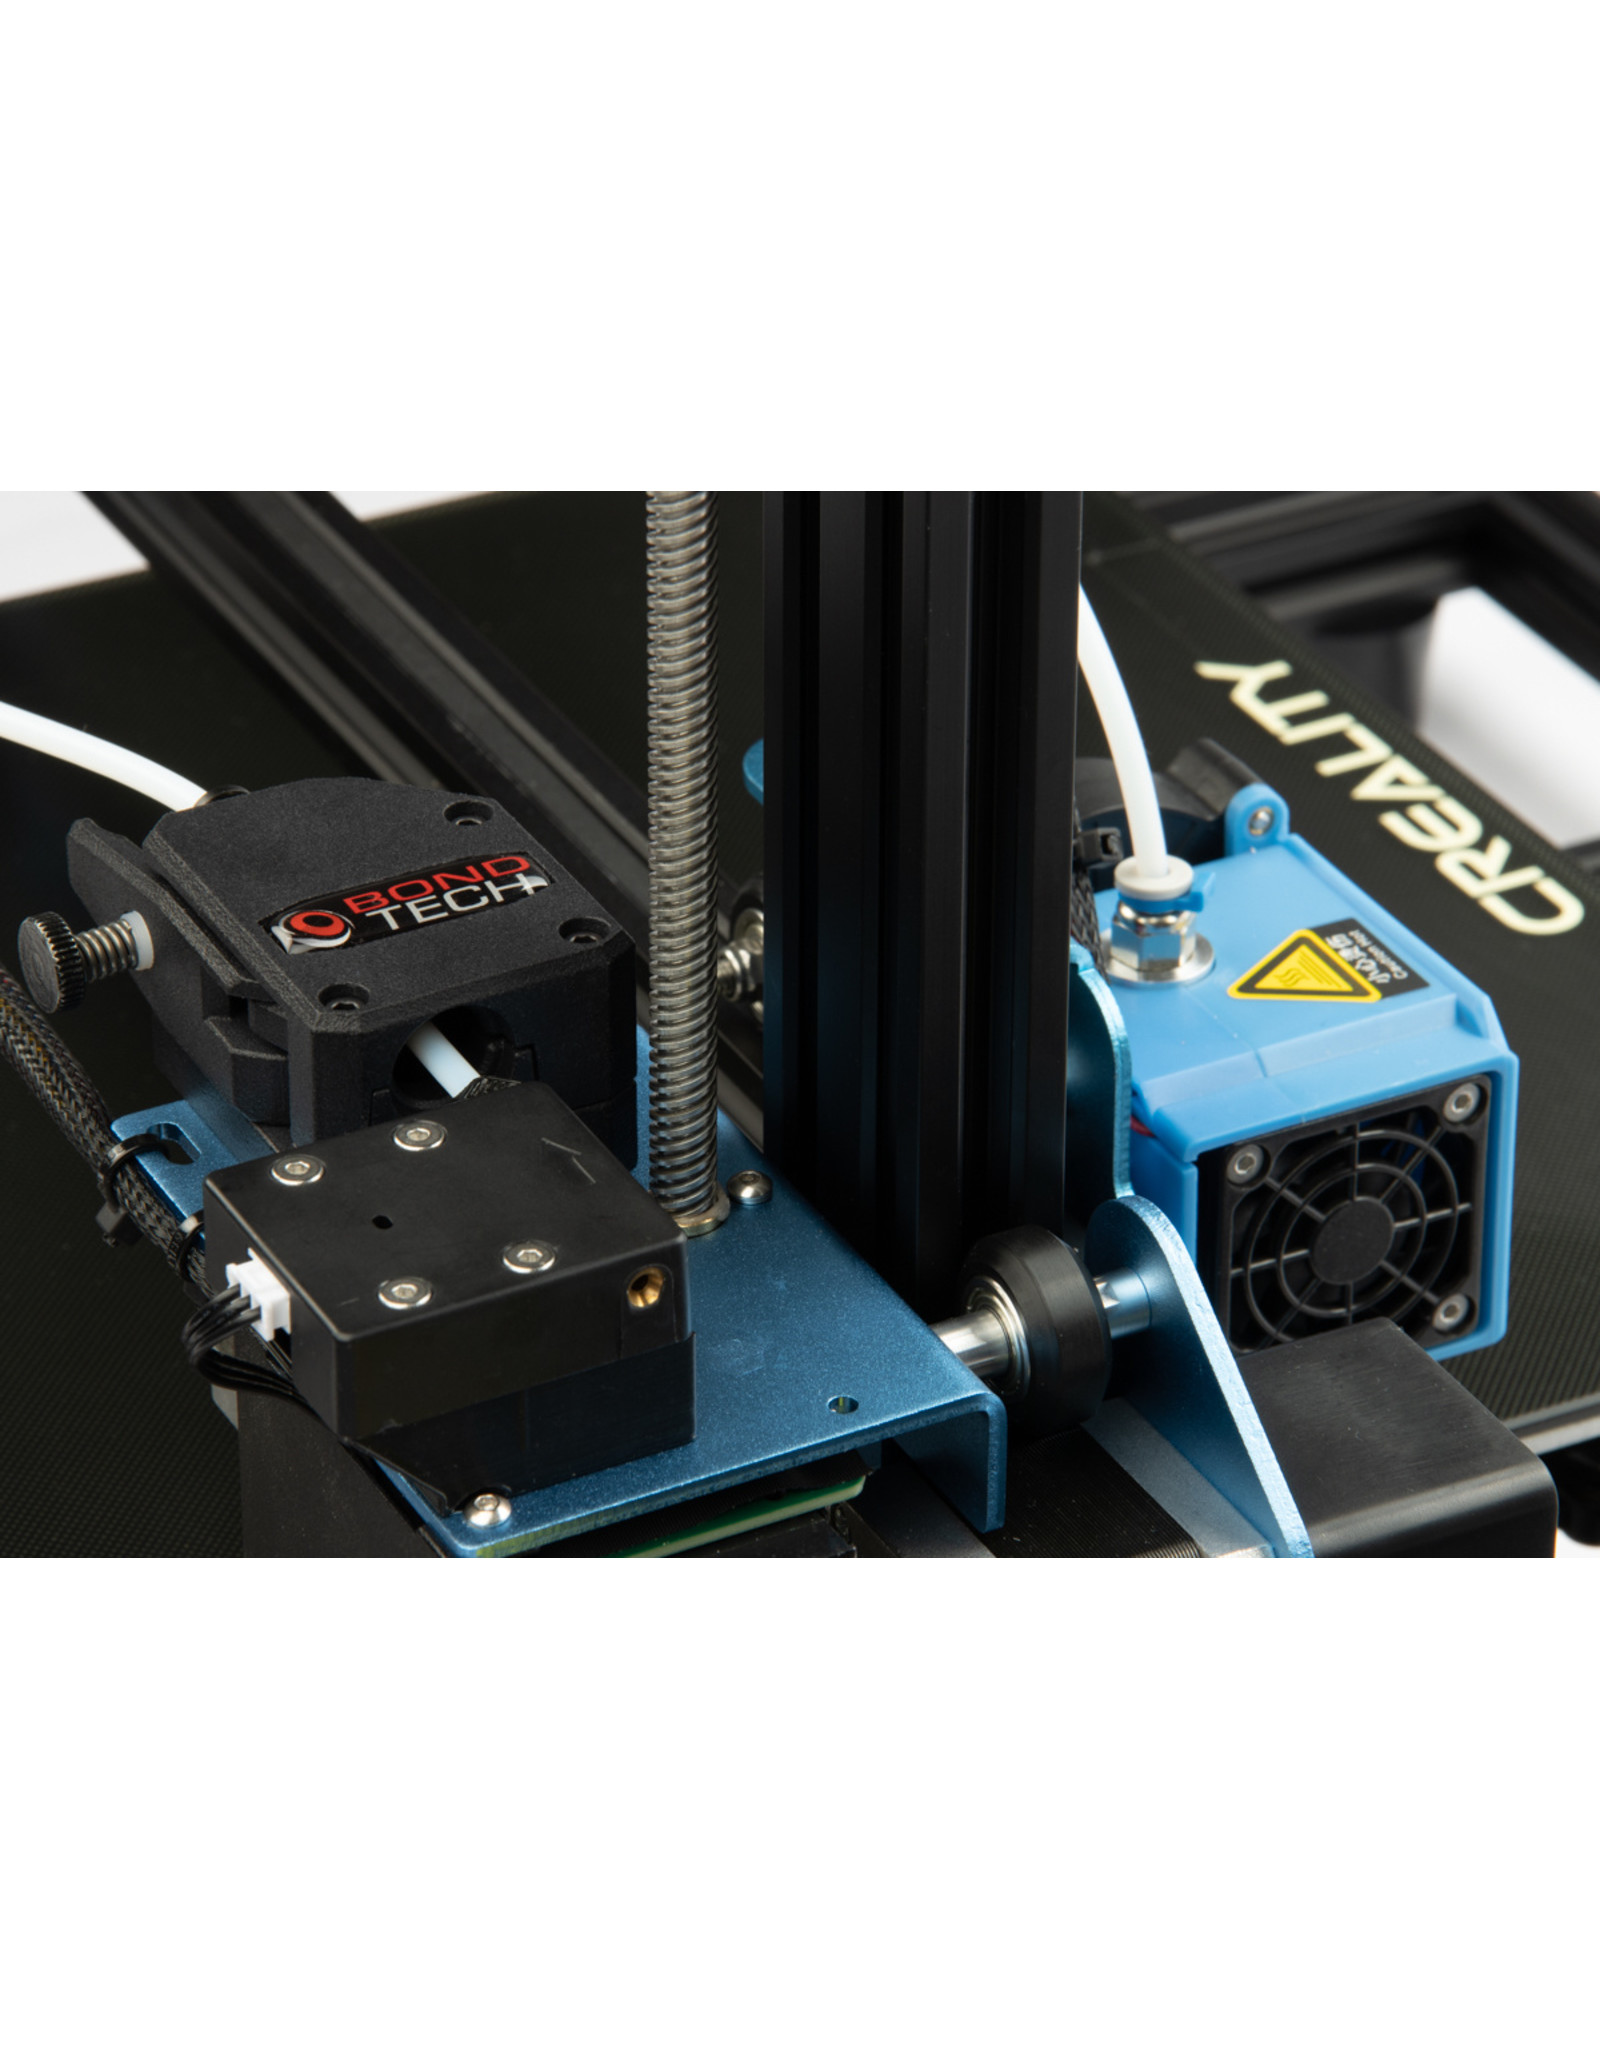 BONDTECH Creality3D CR-10 v2 extruder kit- Verbeterde versie